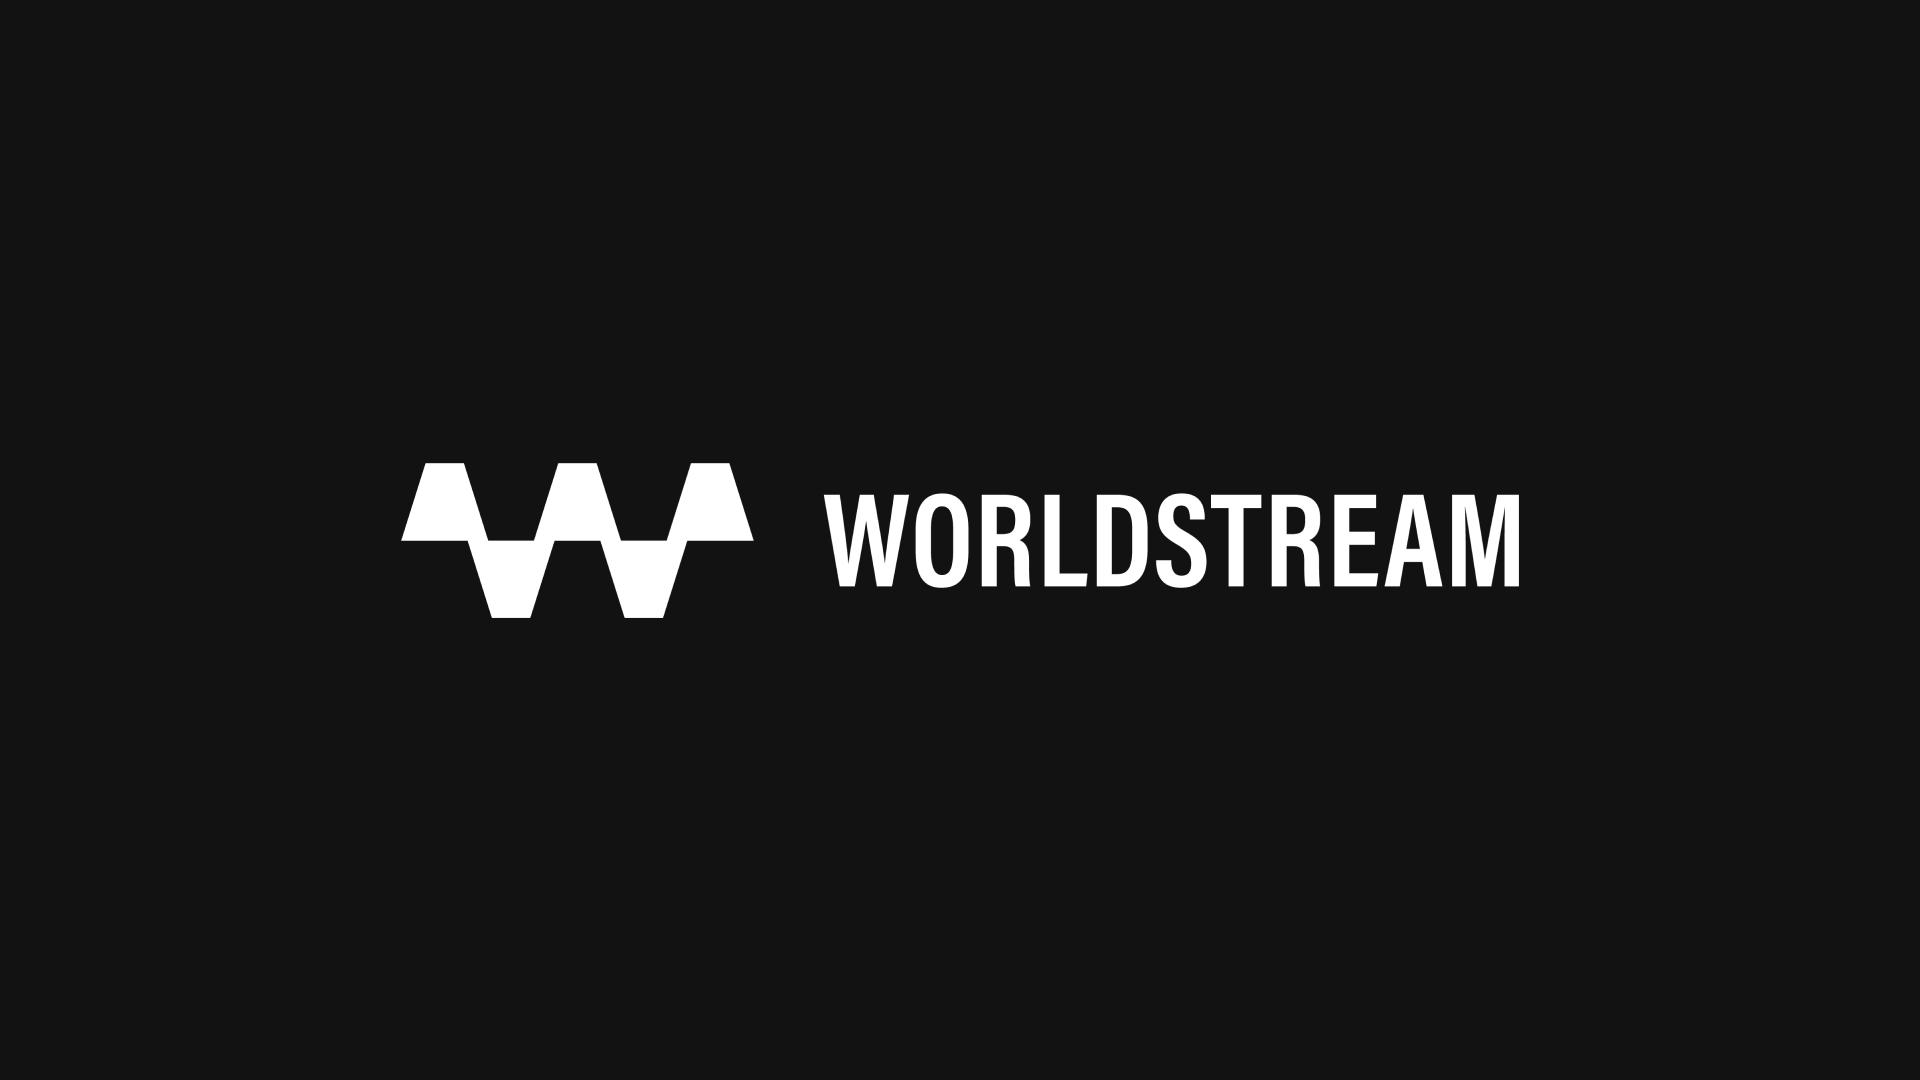 worldstream logo full